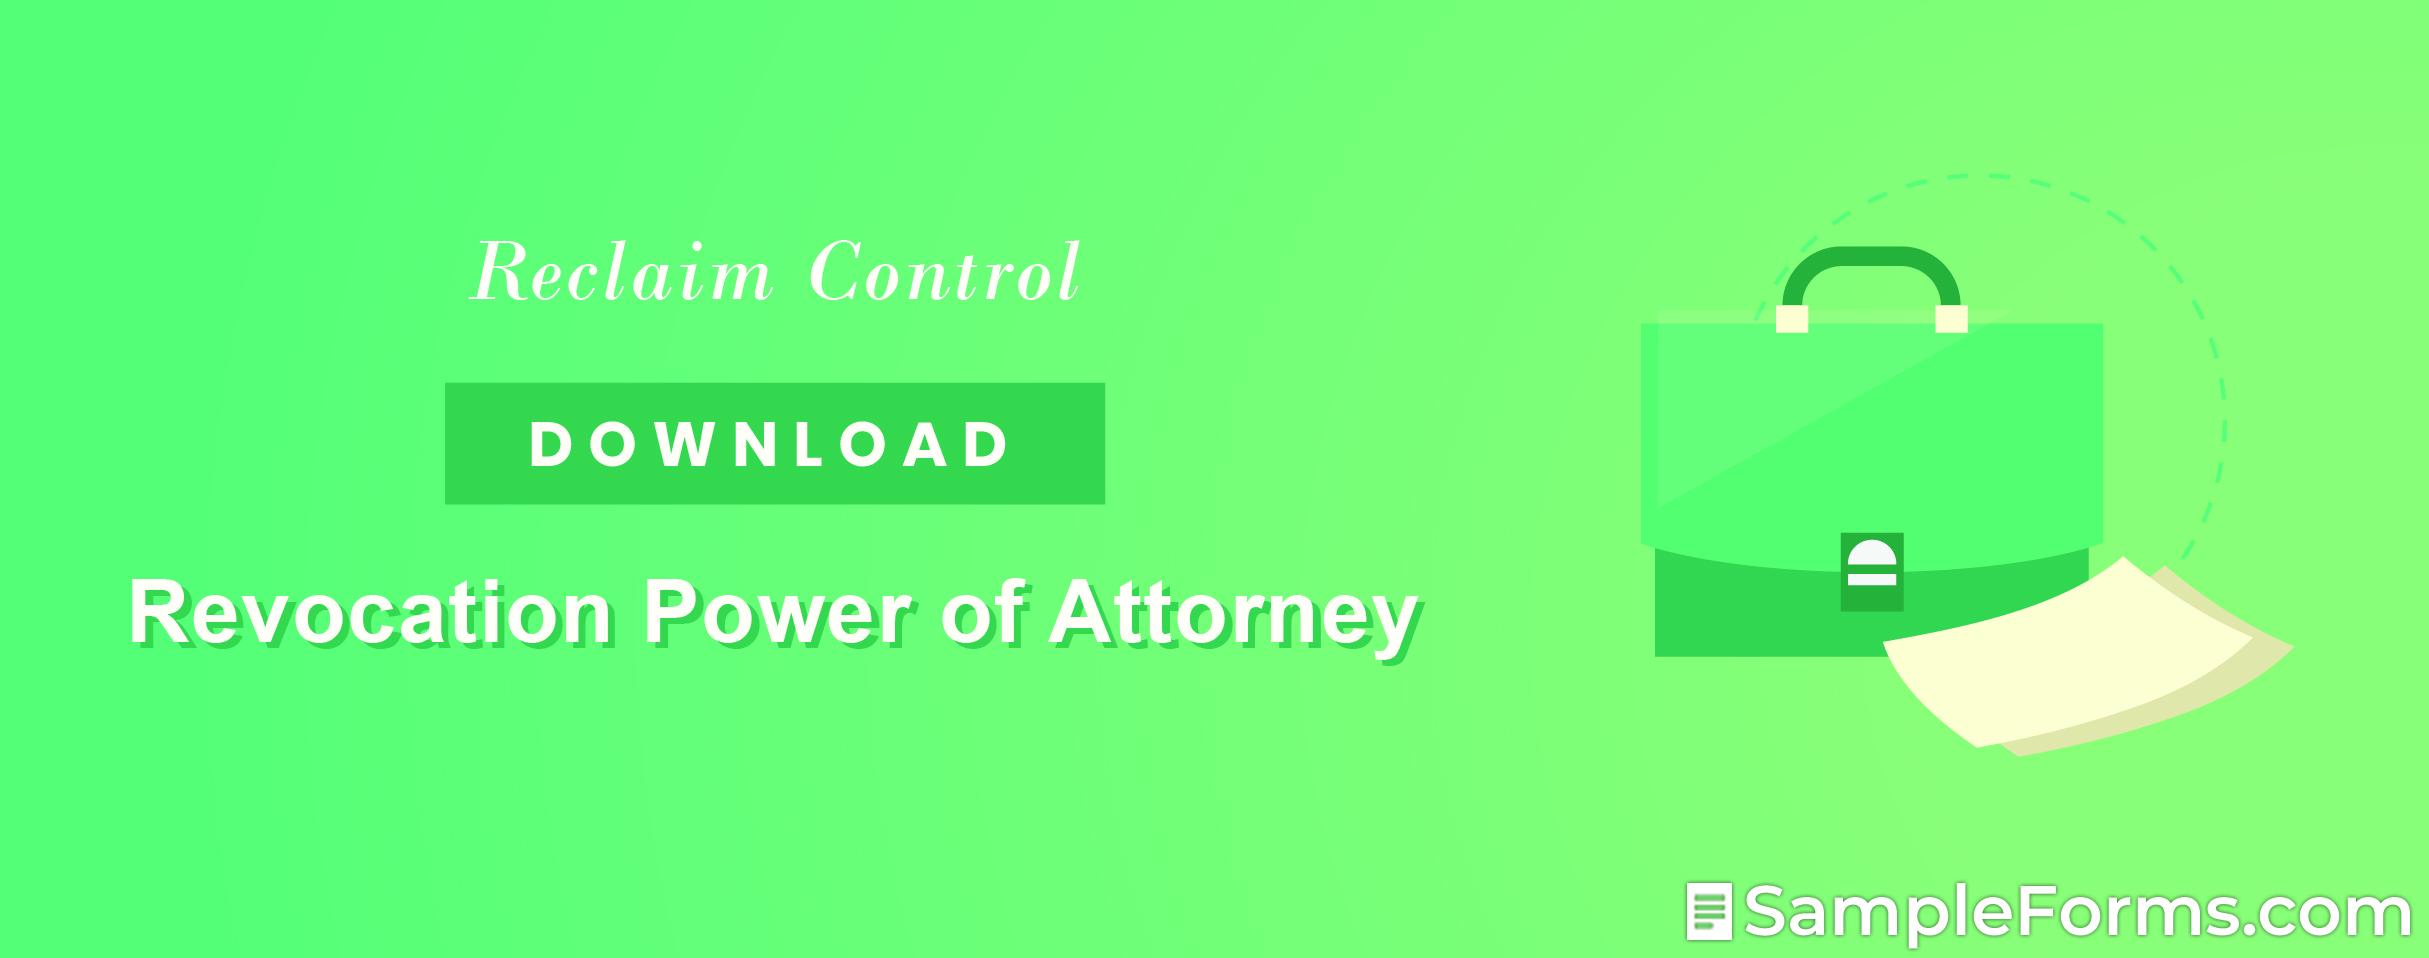 Revocation Power of Attorney